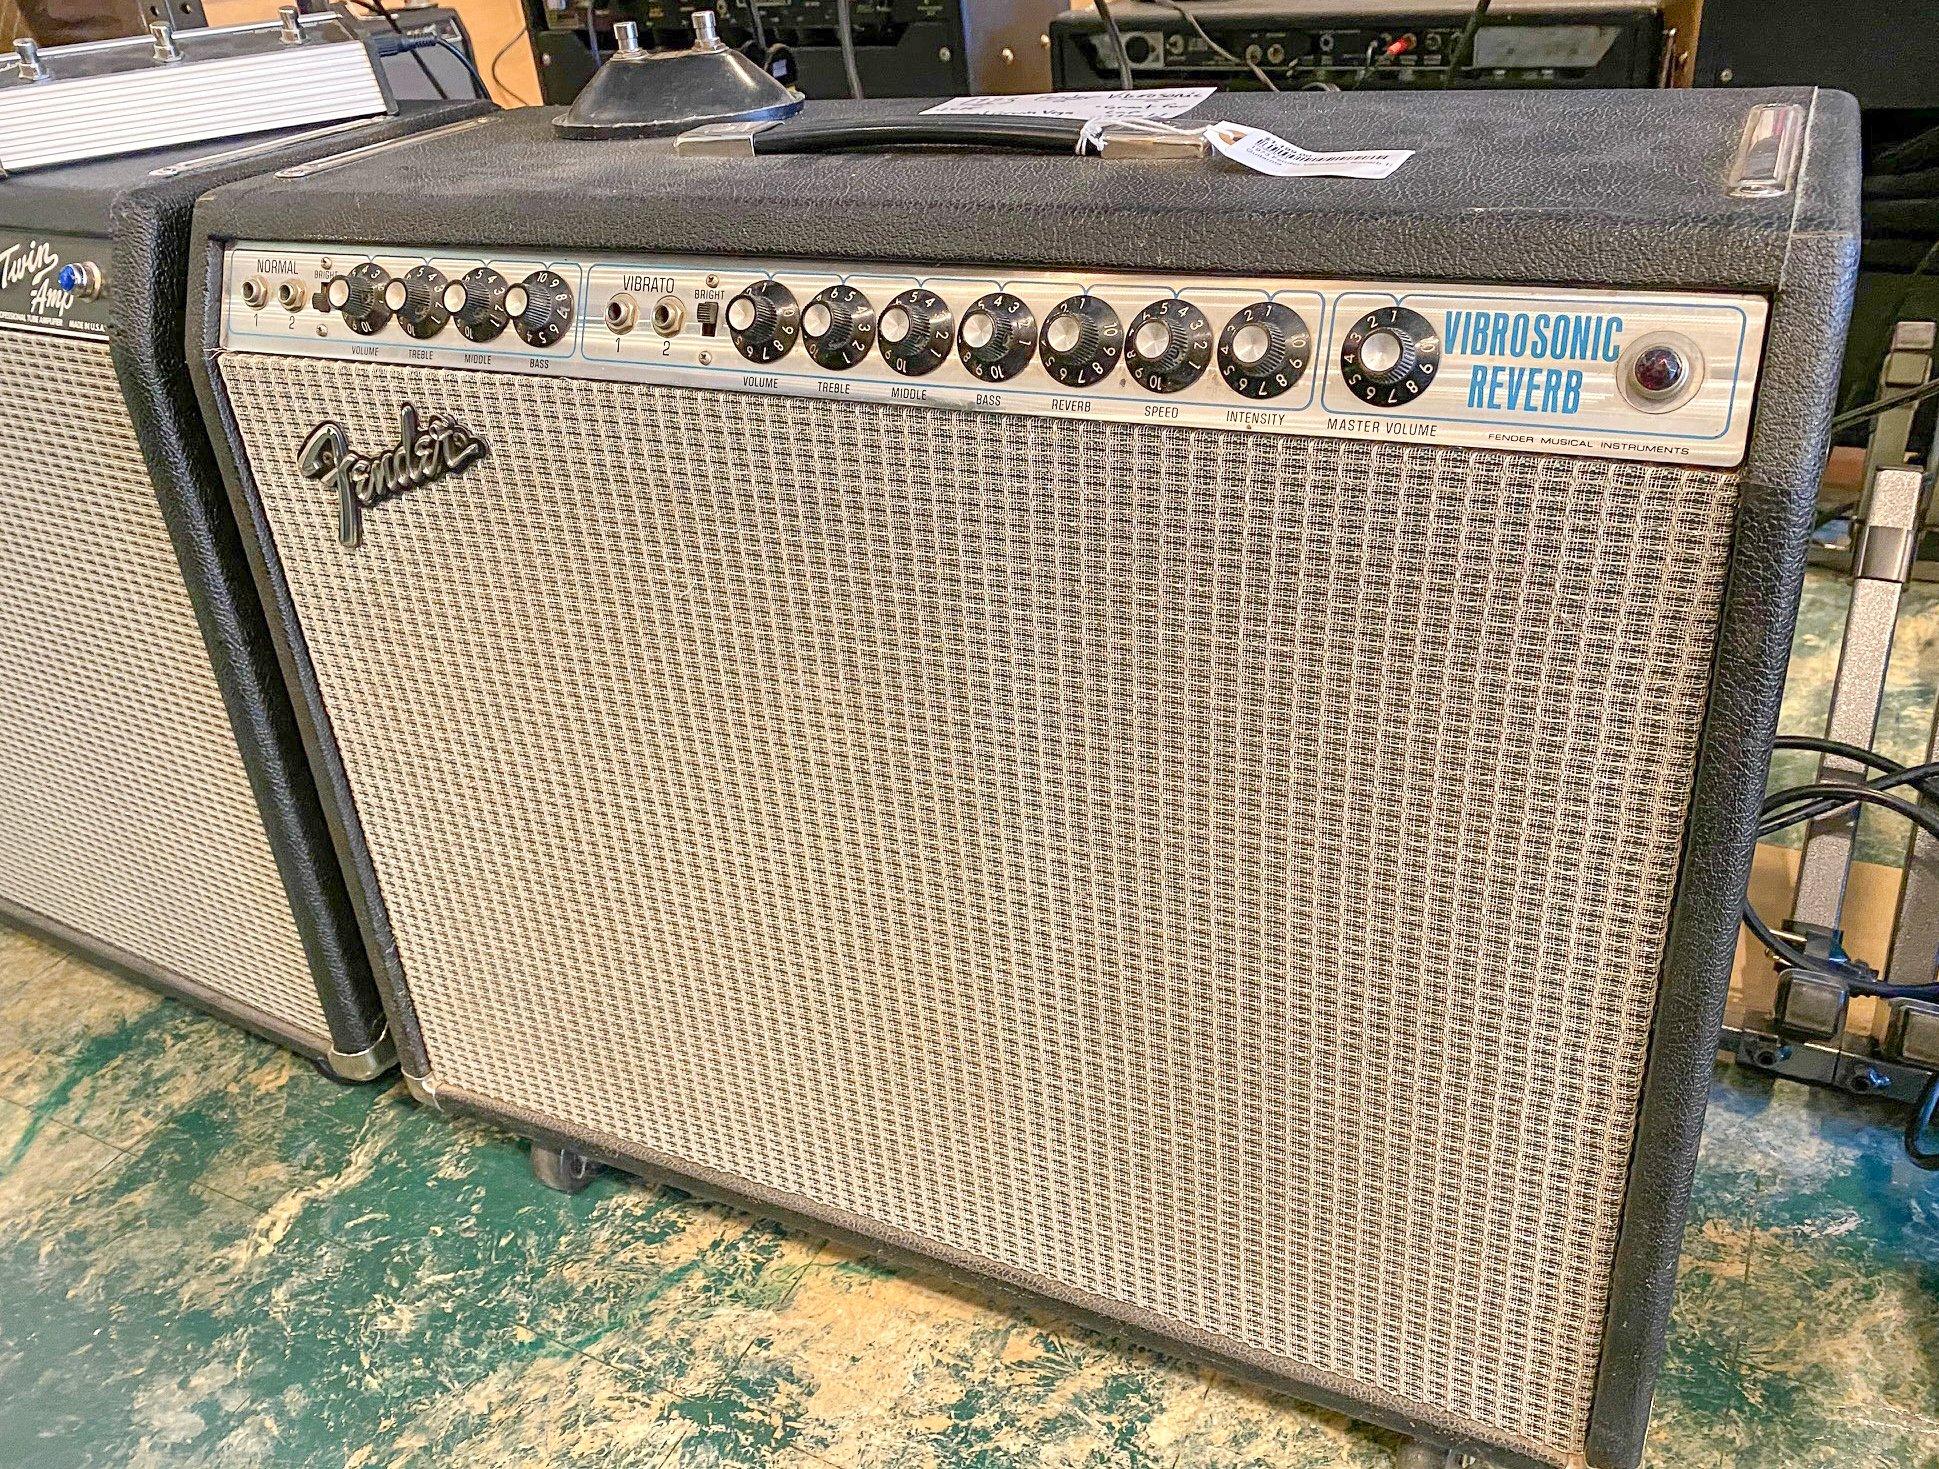 1973 Fender Vibrosonic Reverb 1x15 combo